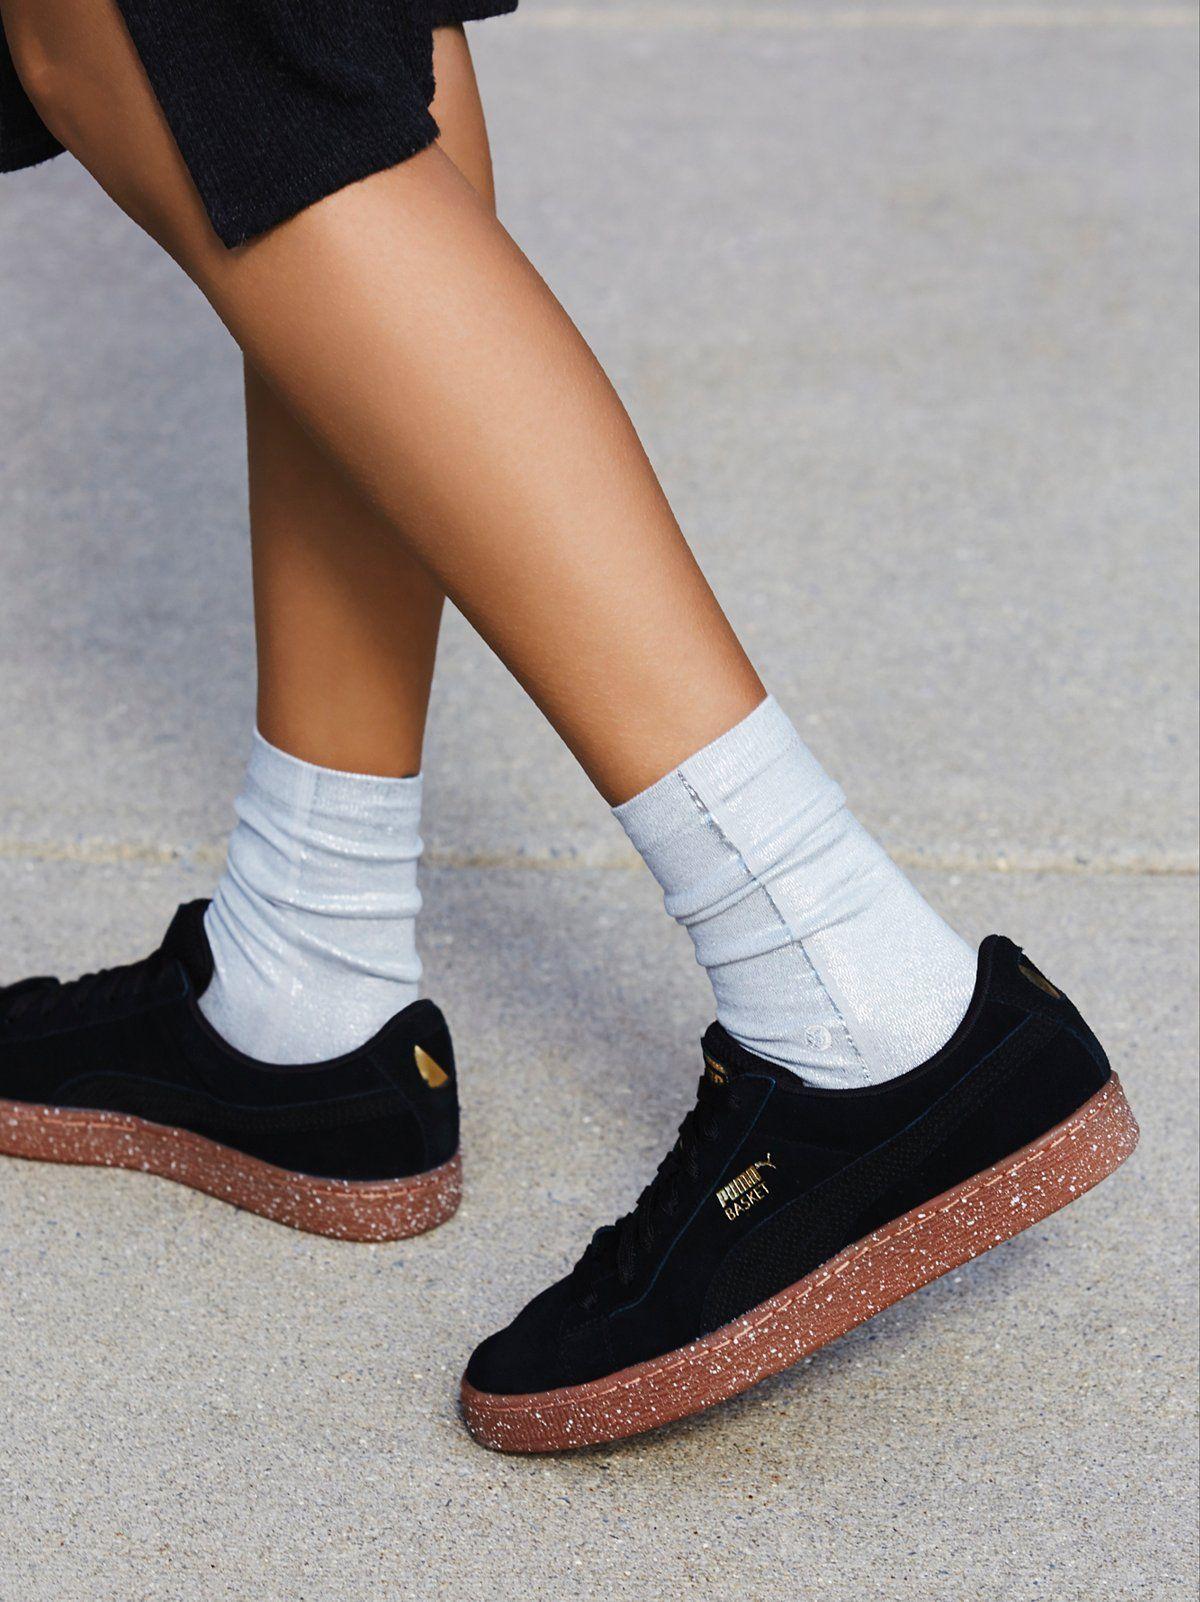 Suede x Careaux Sneaker | Sneakers, Suede sneakers, Shoes